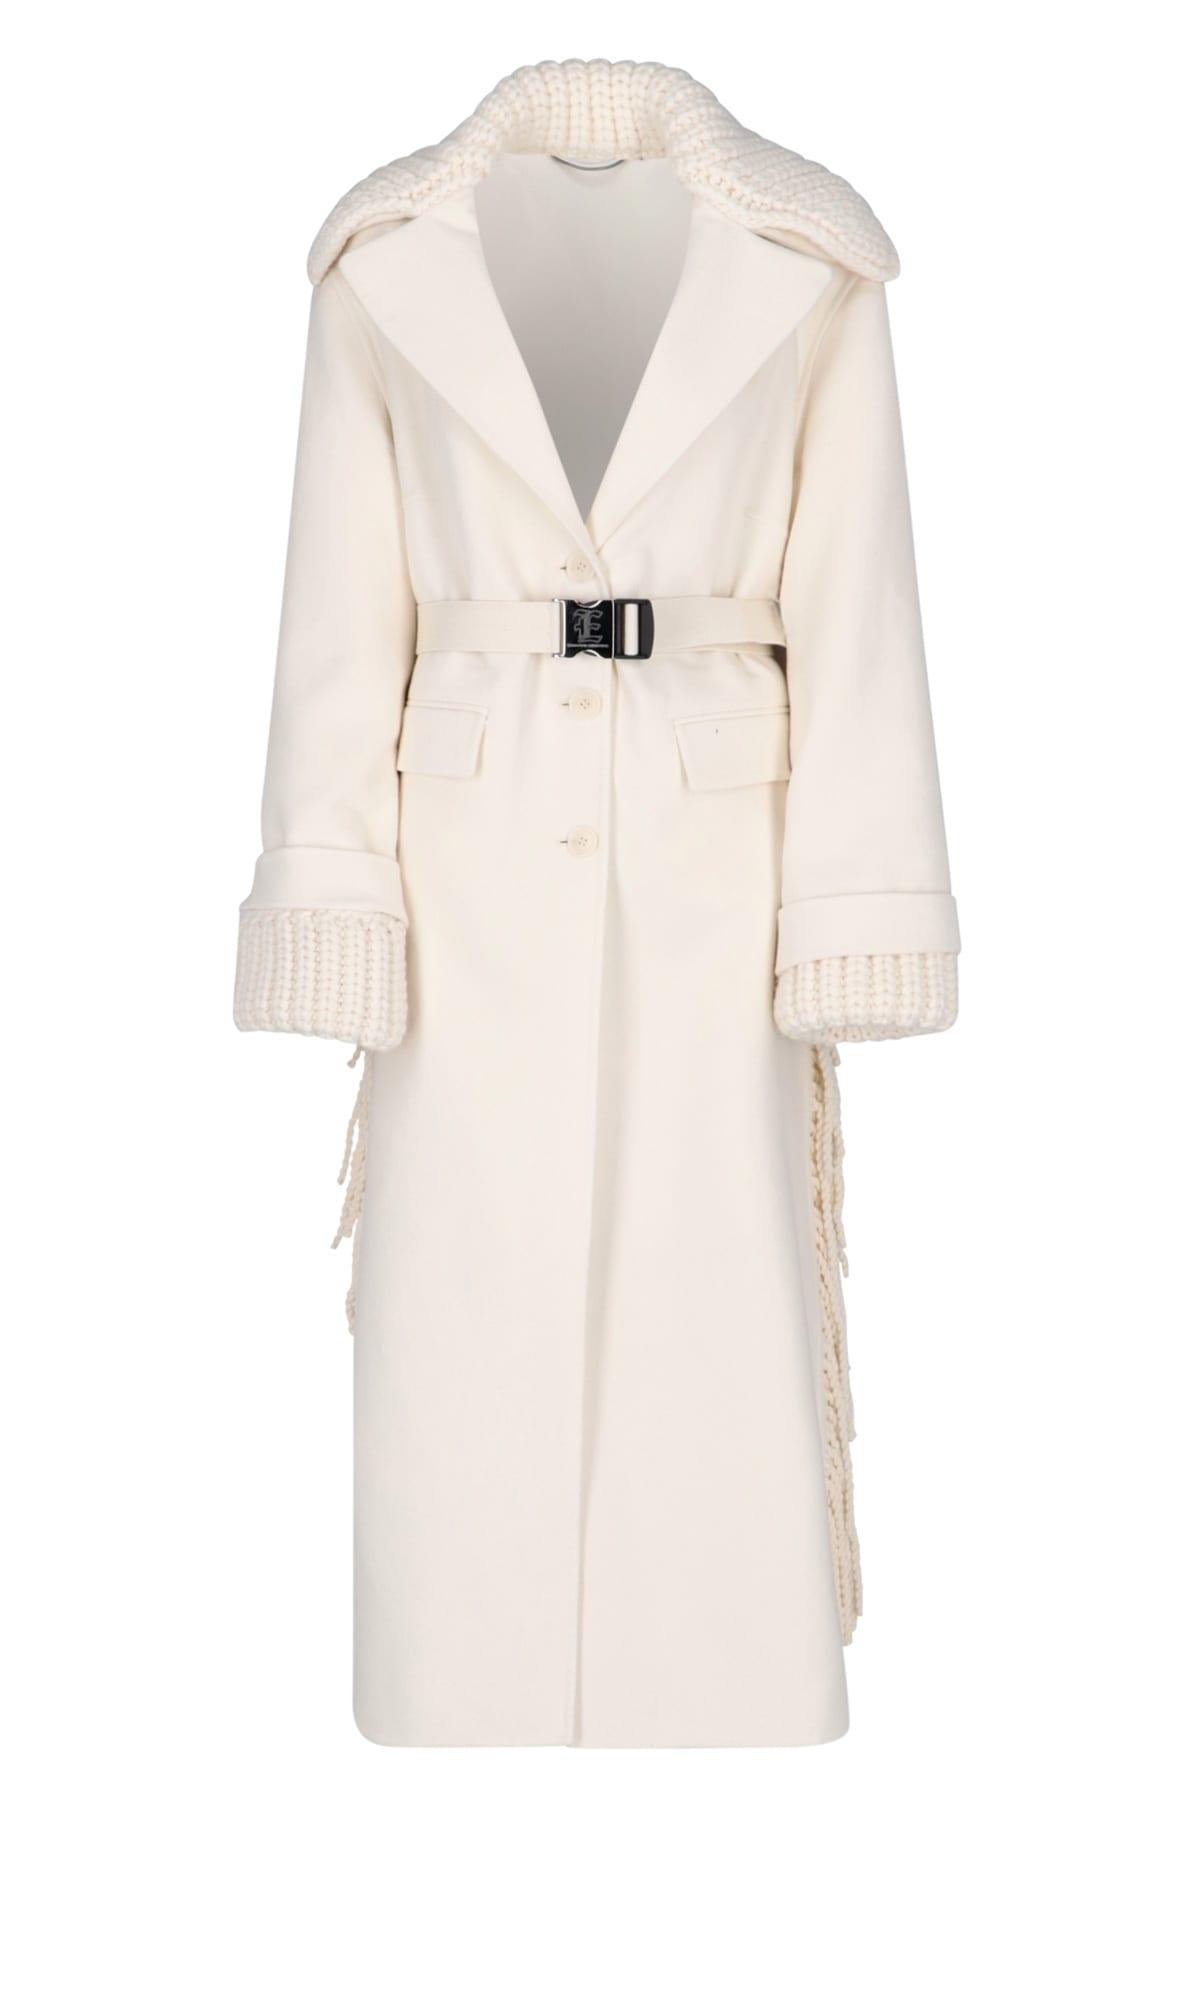 Ermanno Scervino Jacket In White